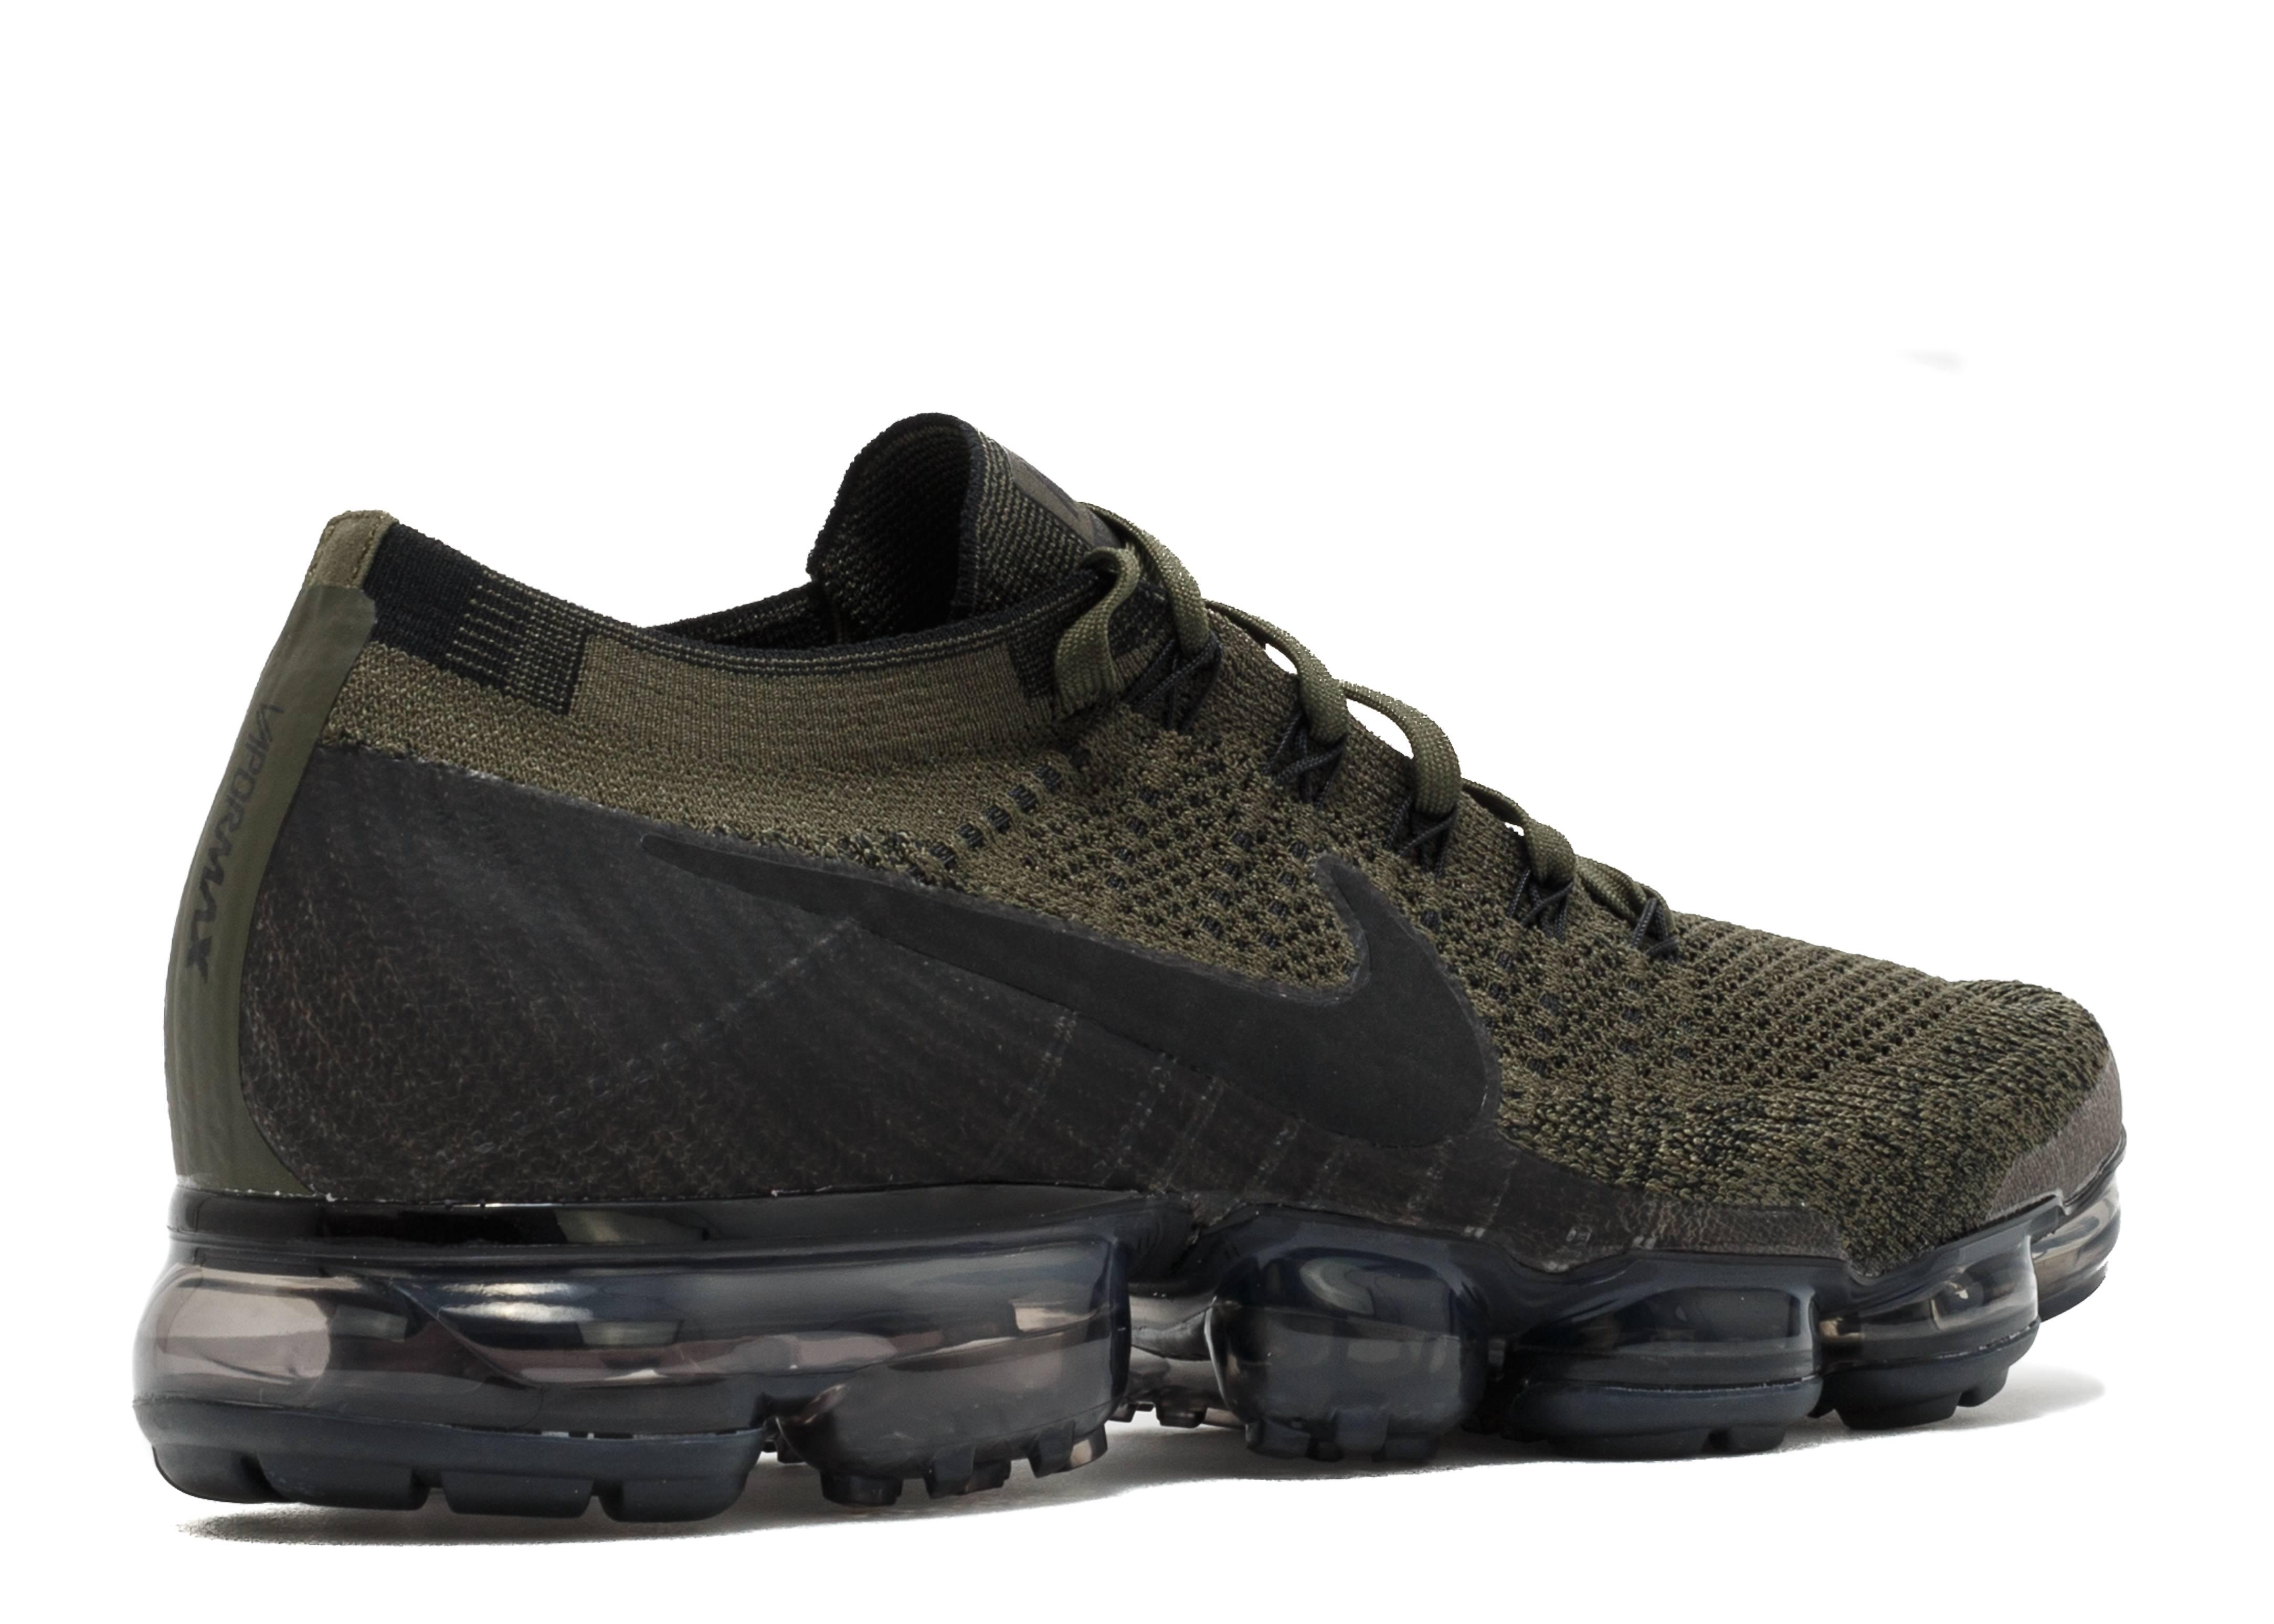 822fdc3facb Air Vapormax Flyknit - Nike - 849558 300 - cargo khaki black-medium olvie